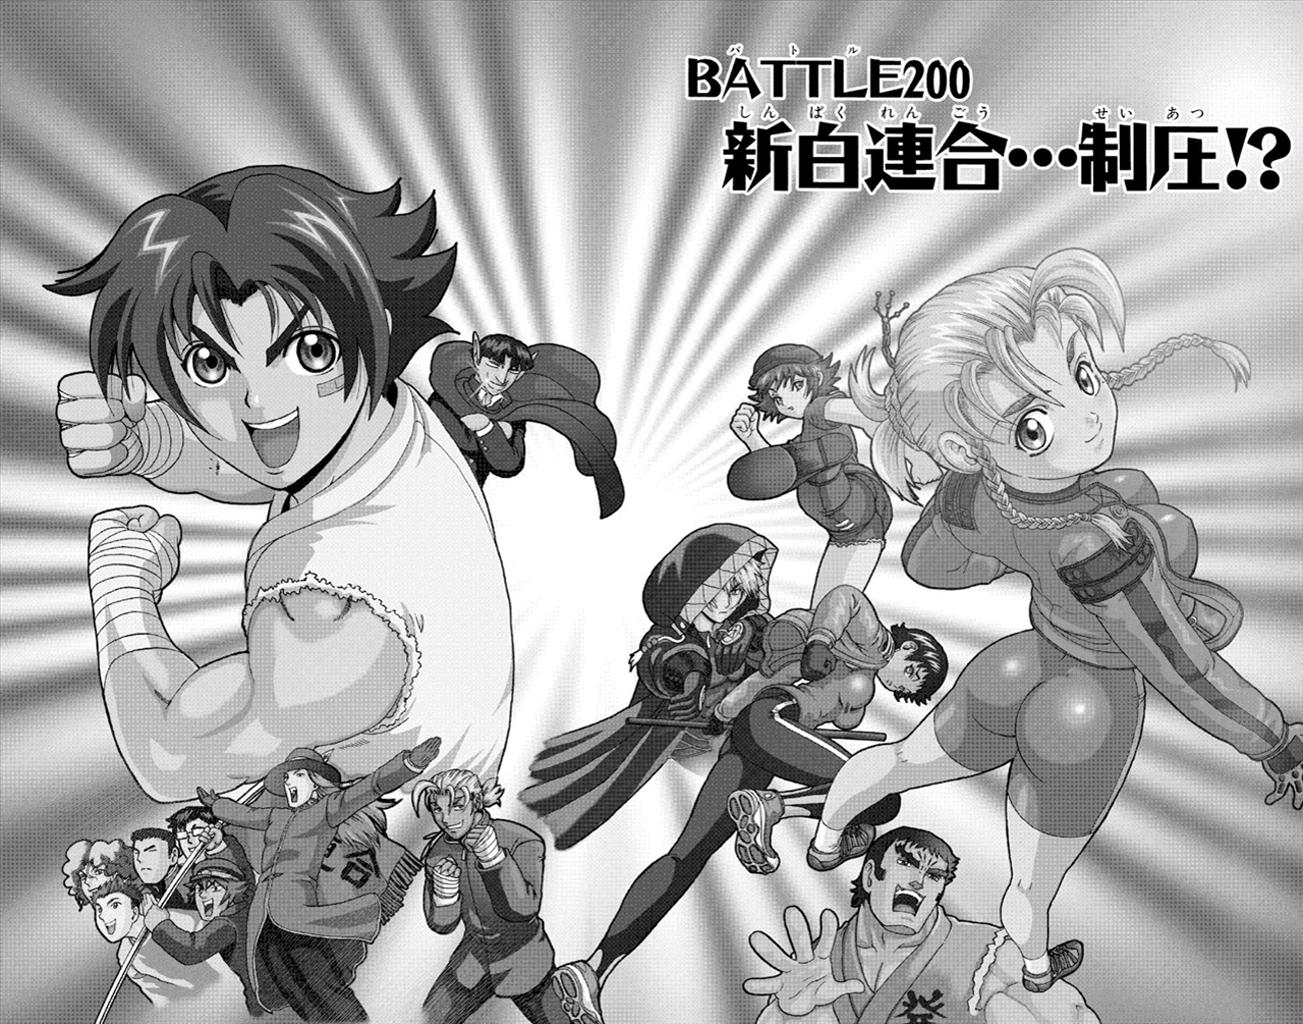 Battle 200